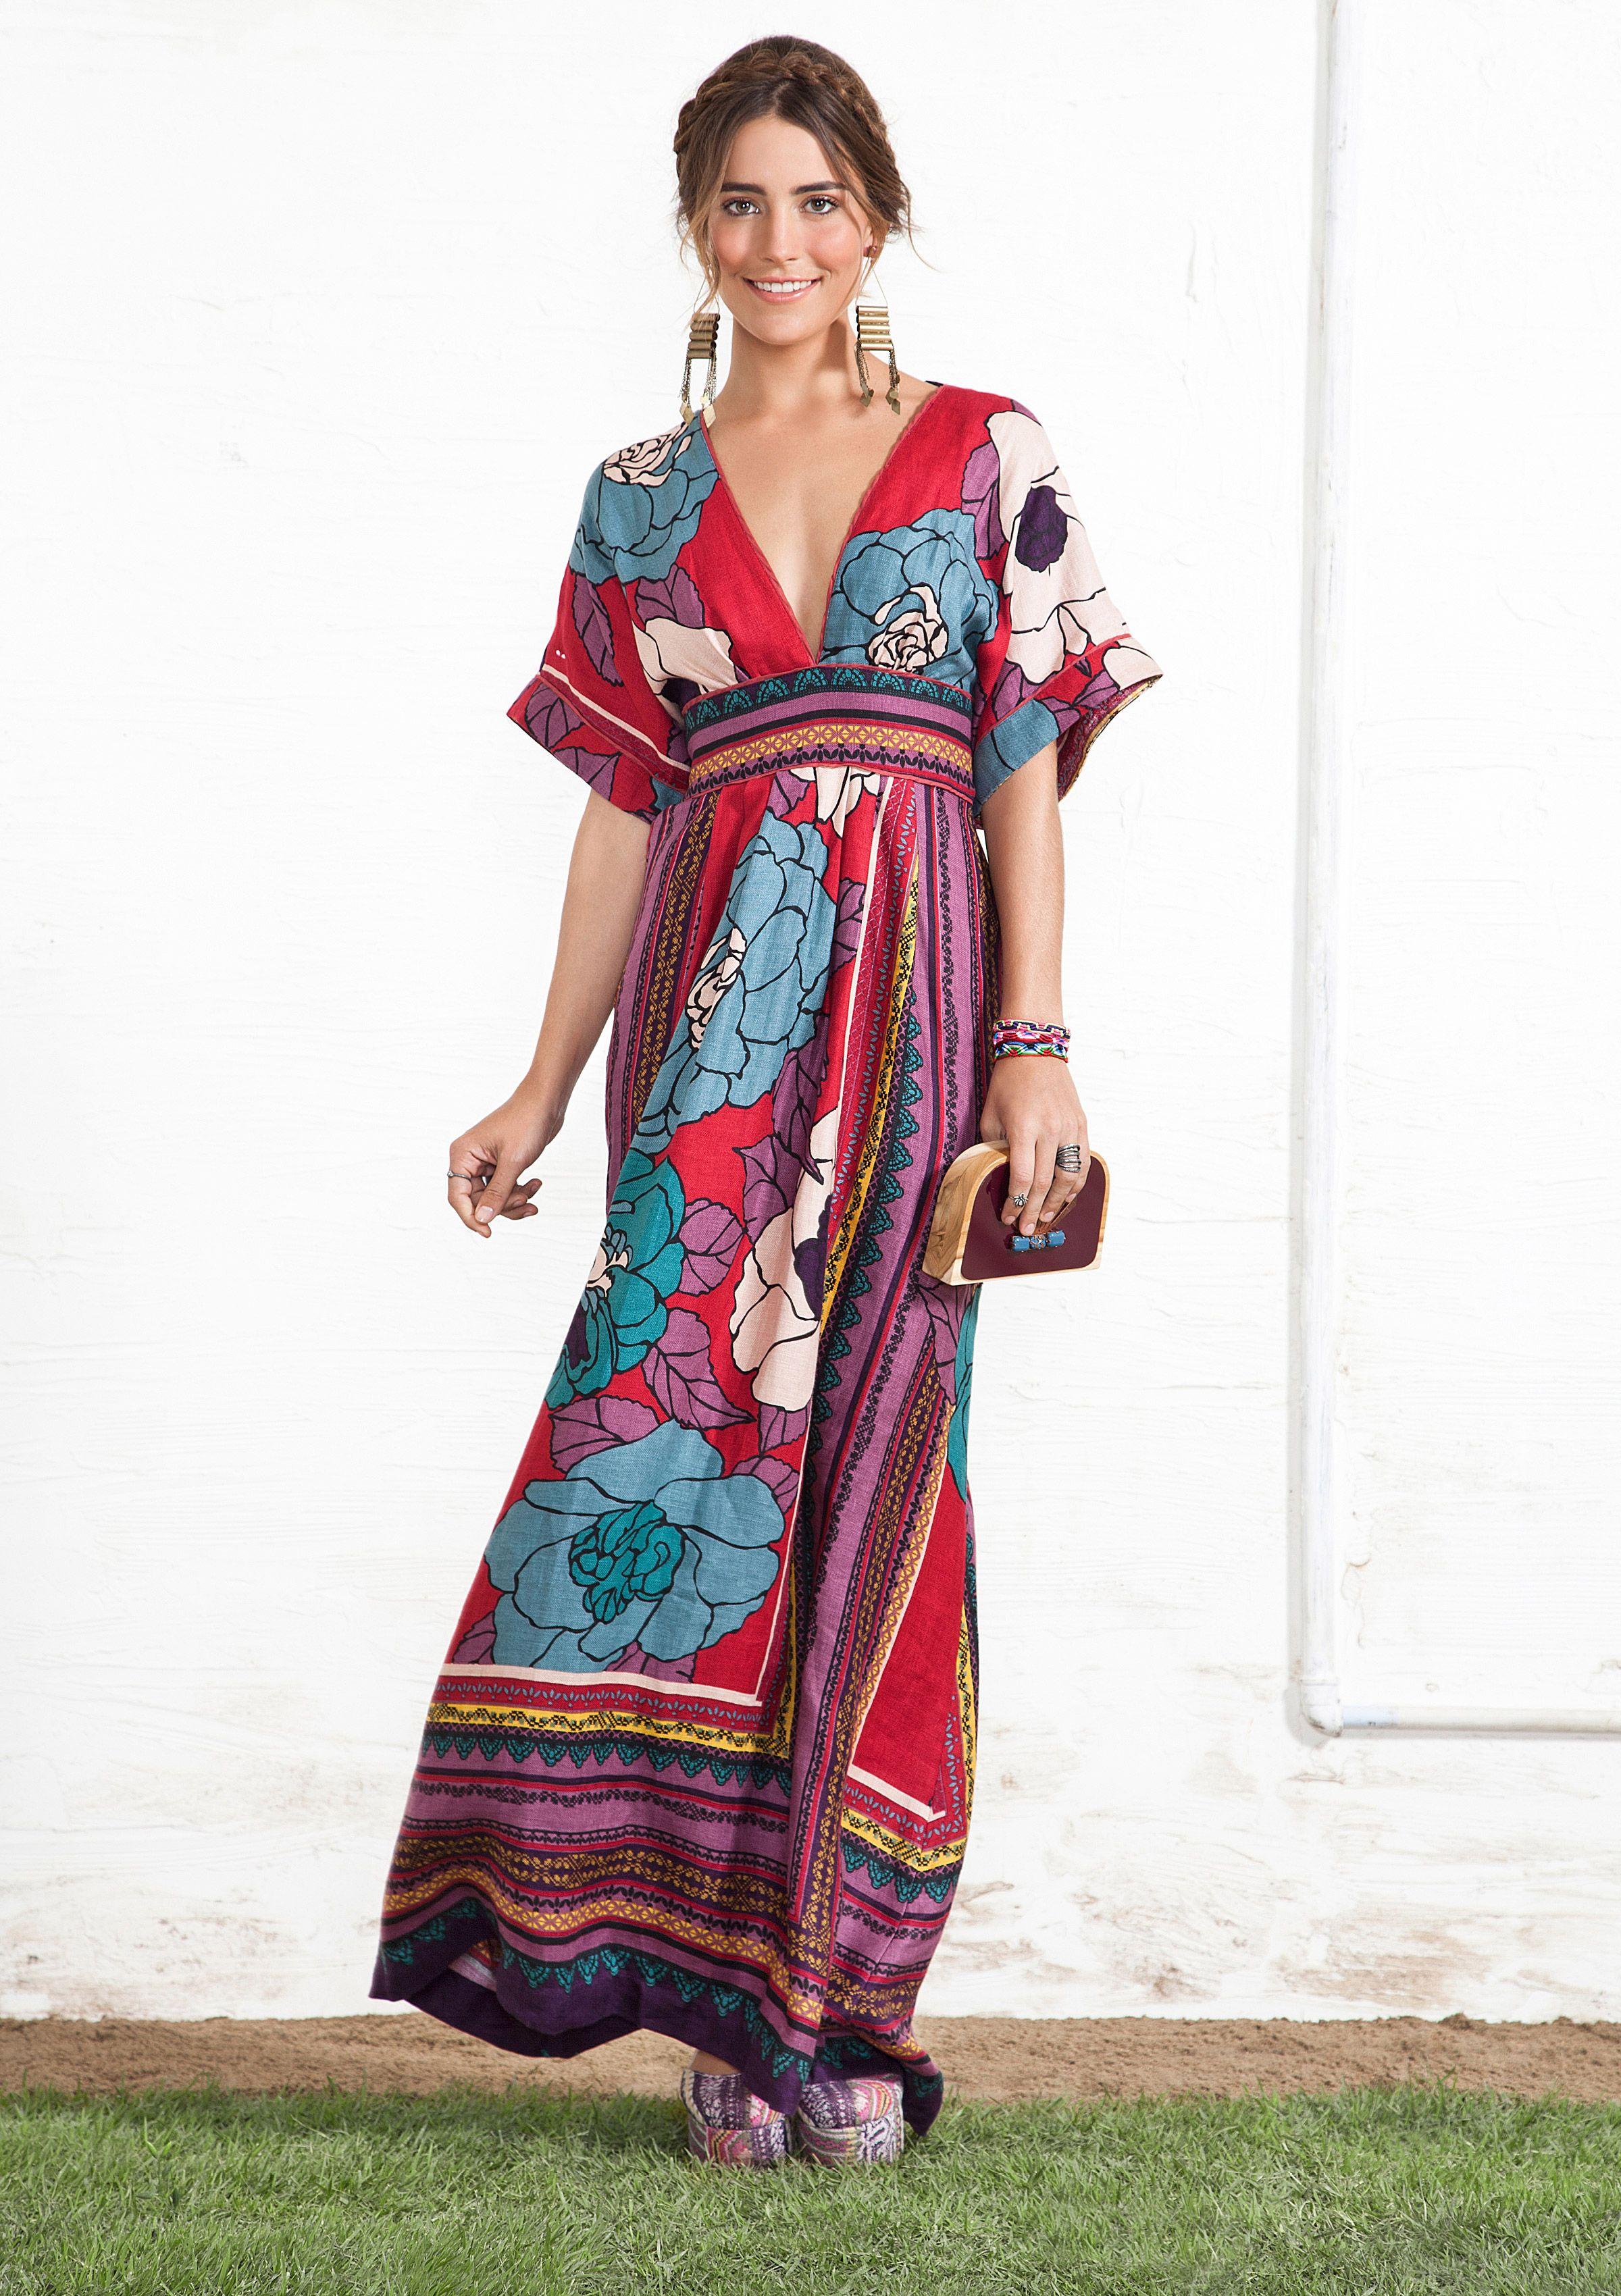 Rio style dress